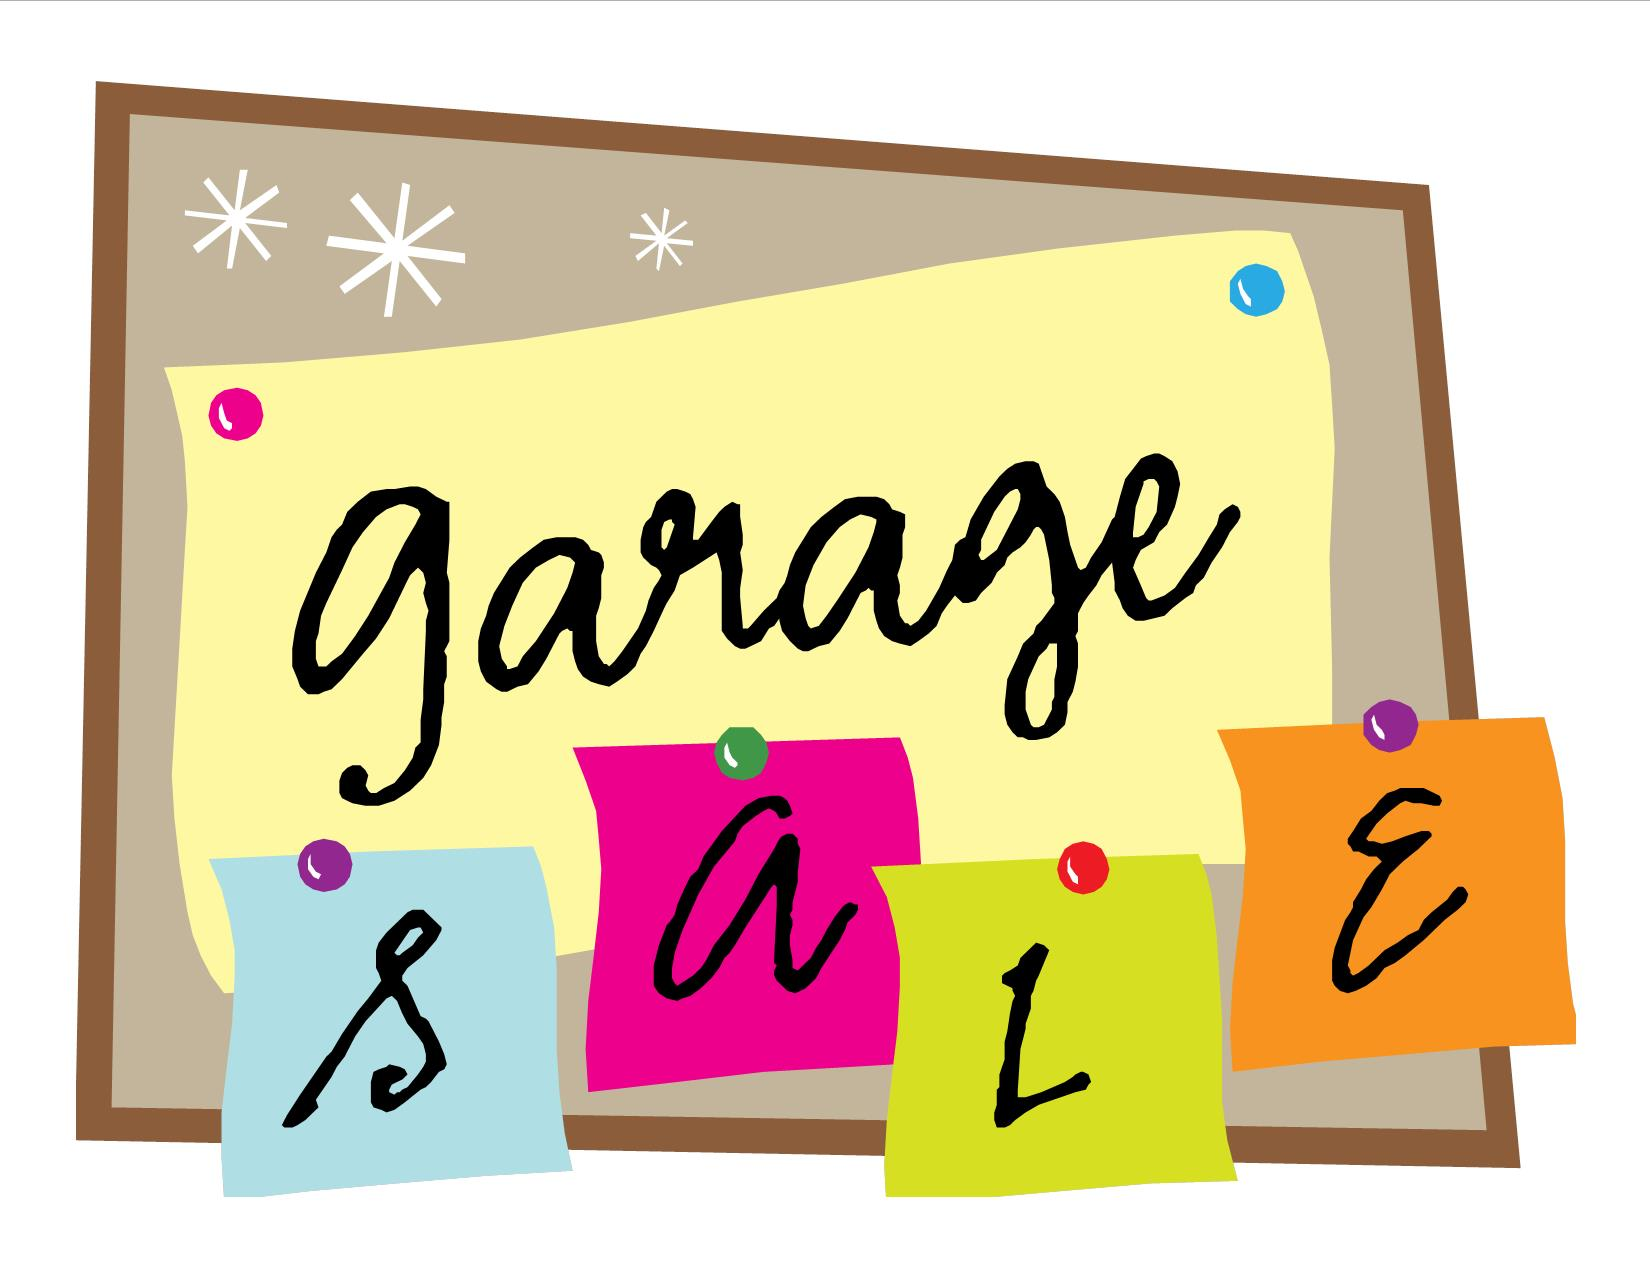 1650x1275 Having A Garage Sale Imconfident